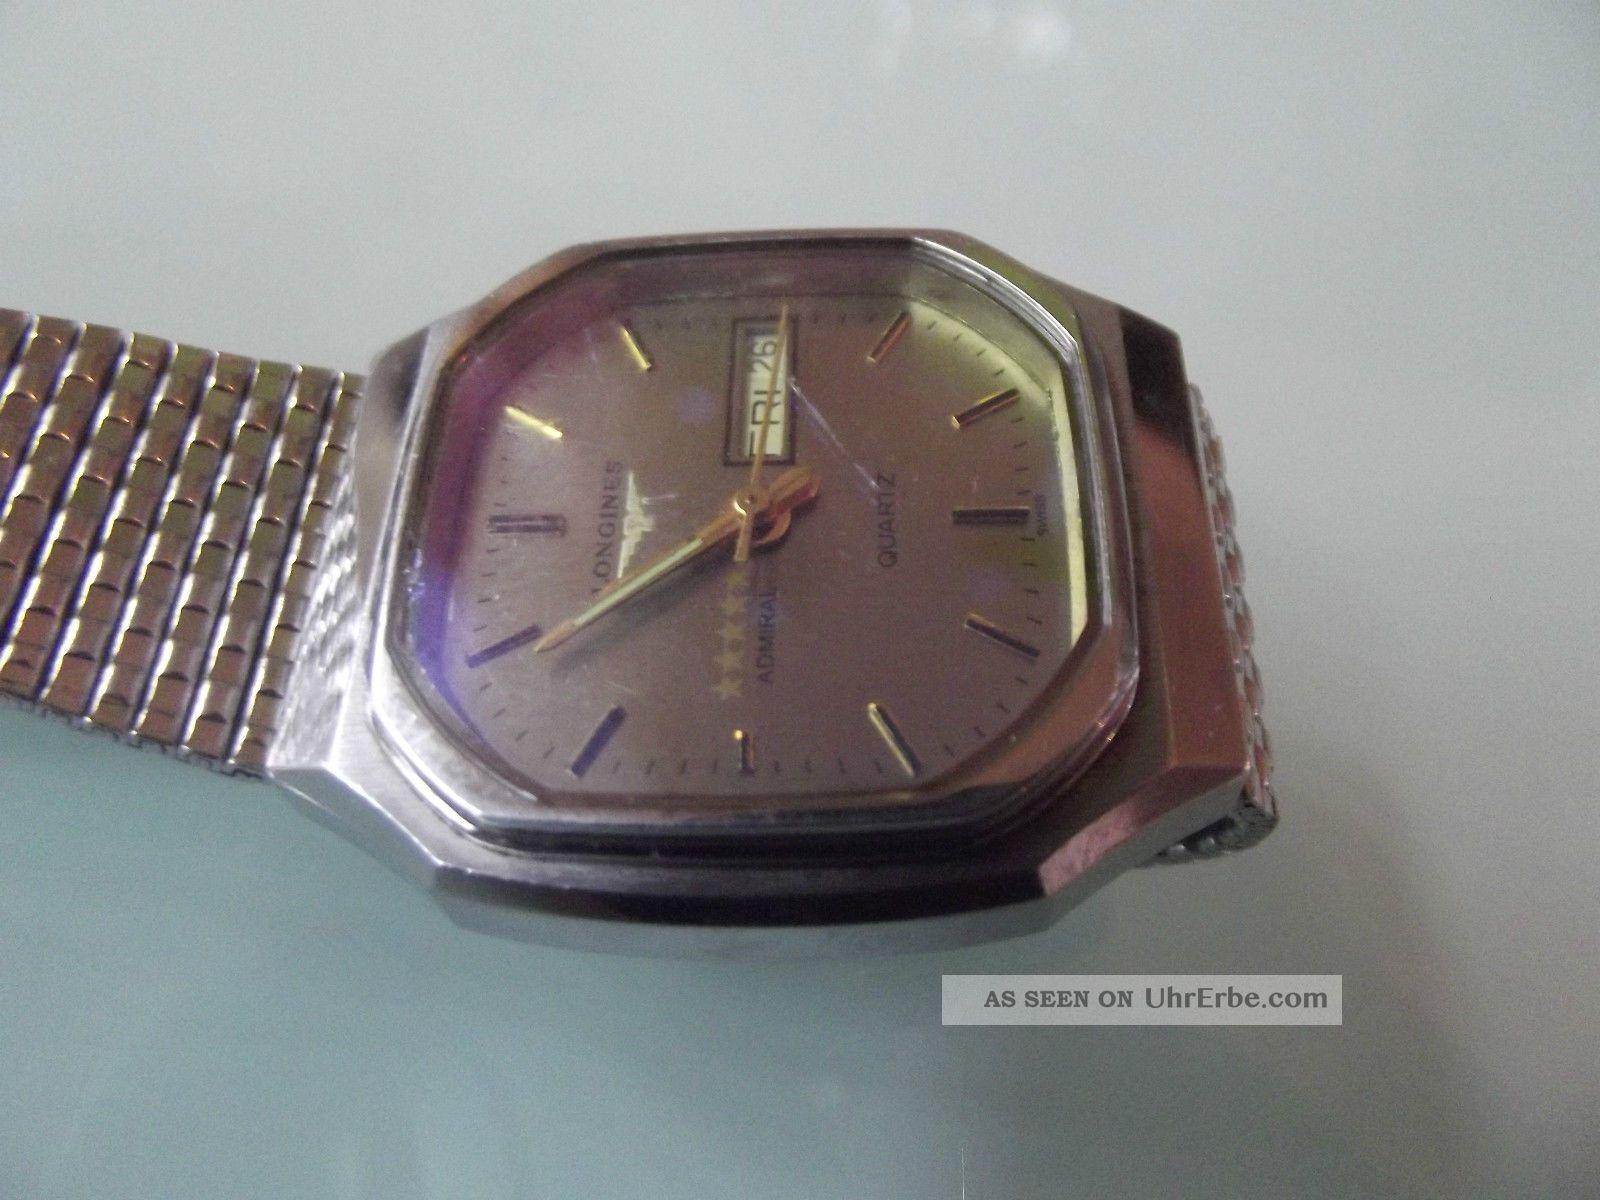 Hau Longines Admiral 5 Sterne Day Date Quartz Edelstahl Armbanduhren Bild